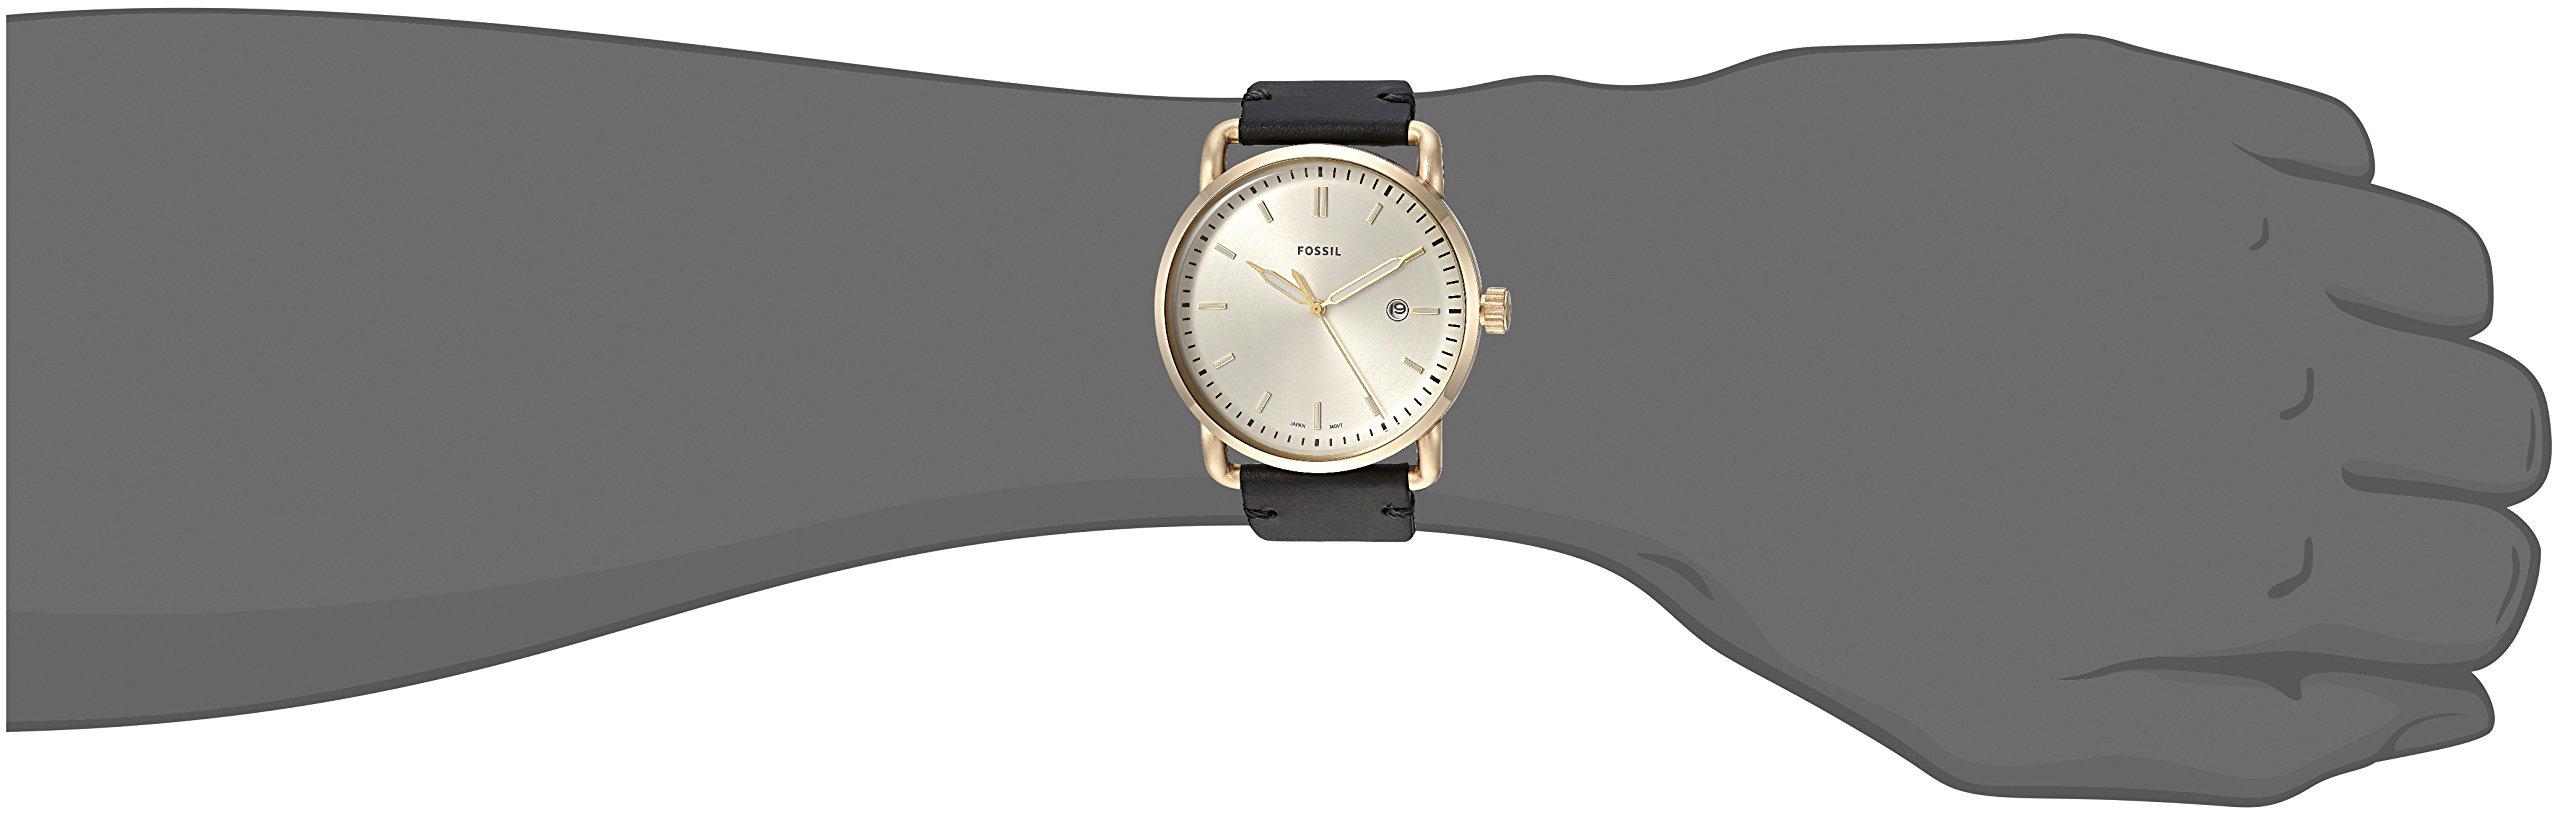 Fossil-Herren-Analog-Quarz-Uhr-mit-Leder-Armband-FS5387